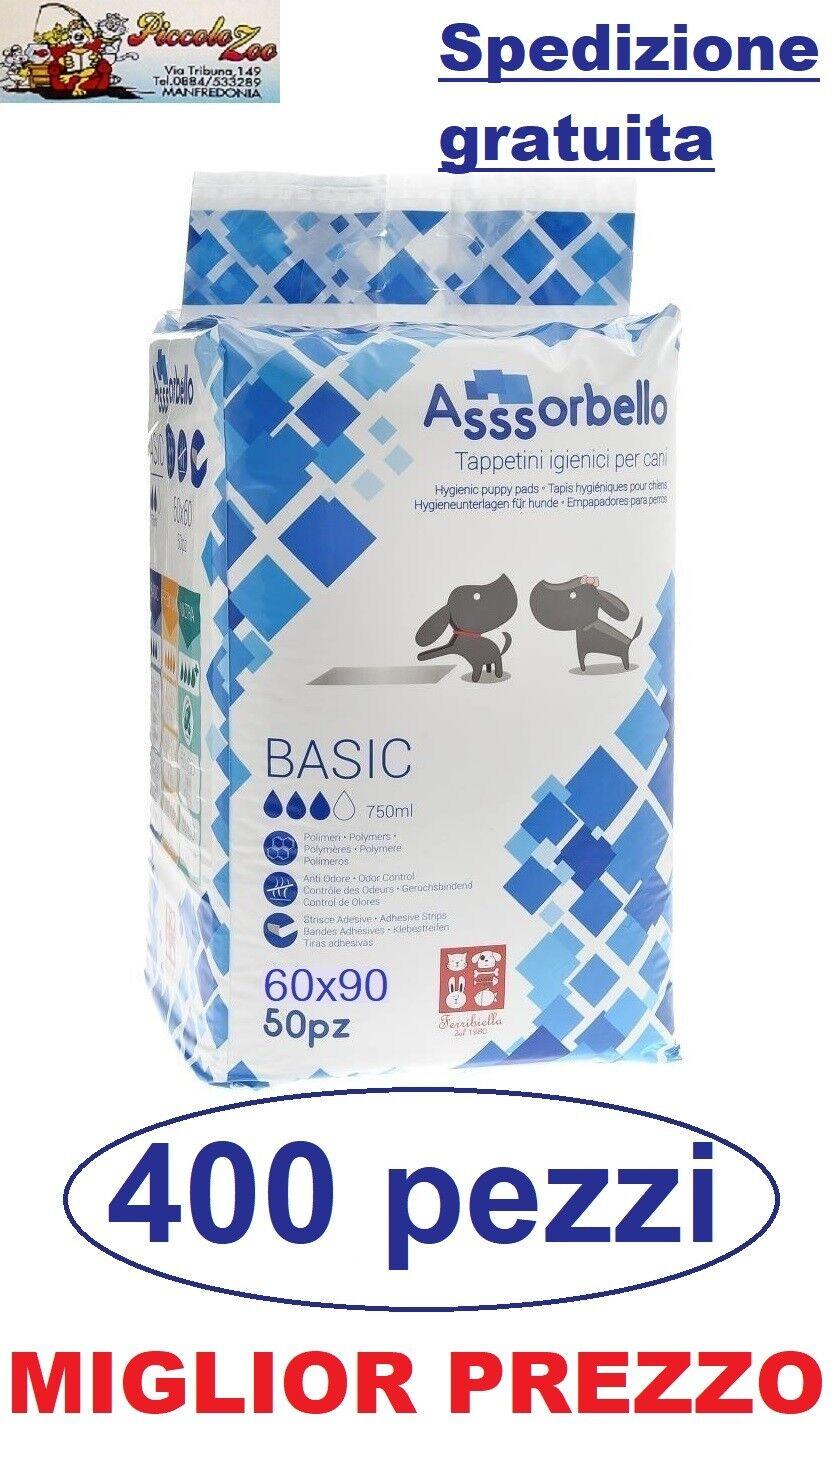 Assorbello Basic 60x90 traverse tappetini igienici assorbenti per cani 400 pezzi